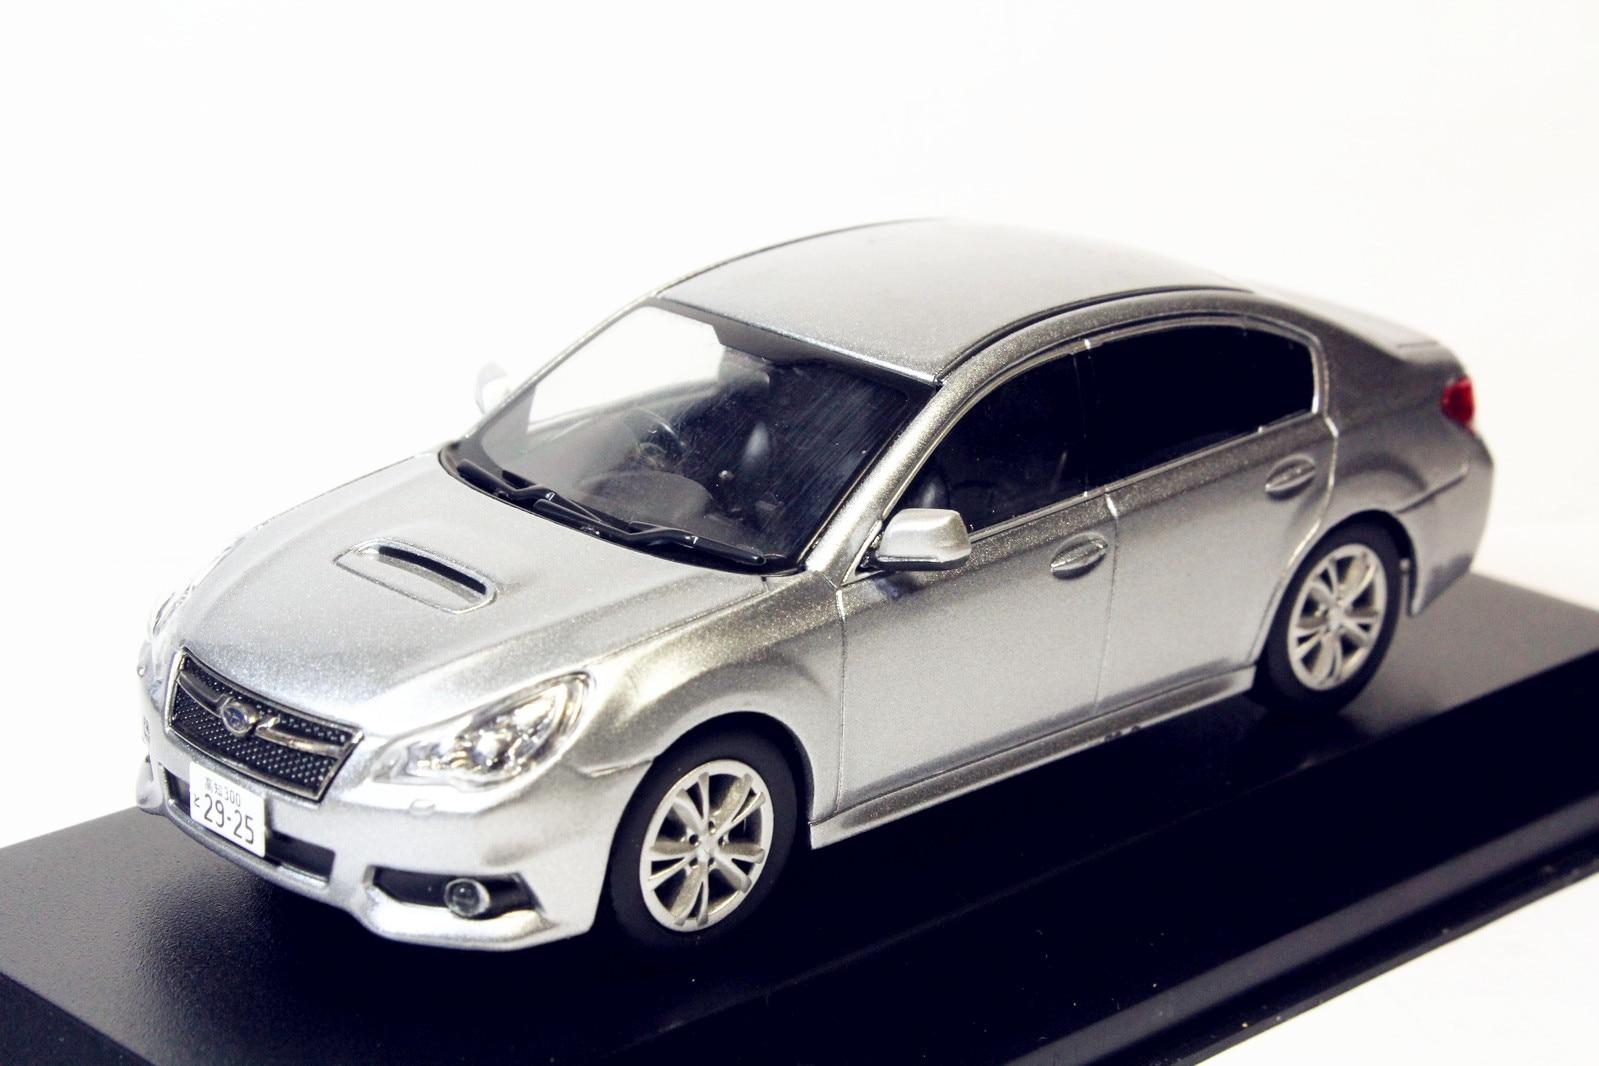 Subaru Legacy B4, juguete en miniatura de plata, moldeado a presión, regalo, 1/43